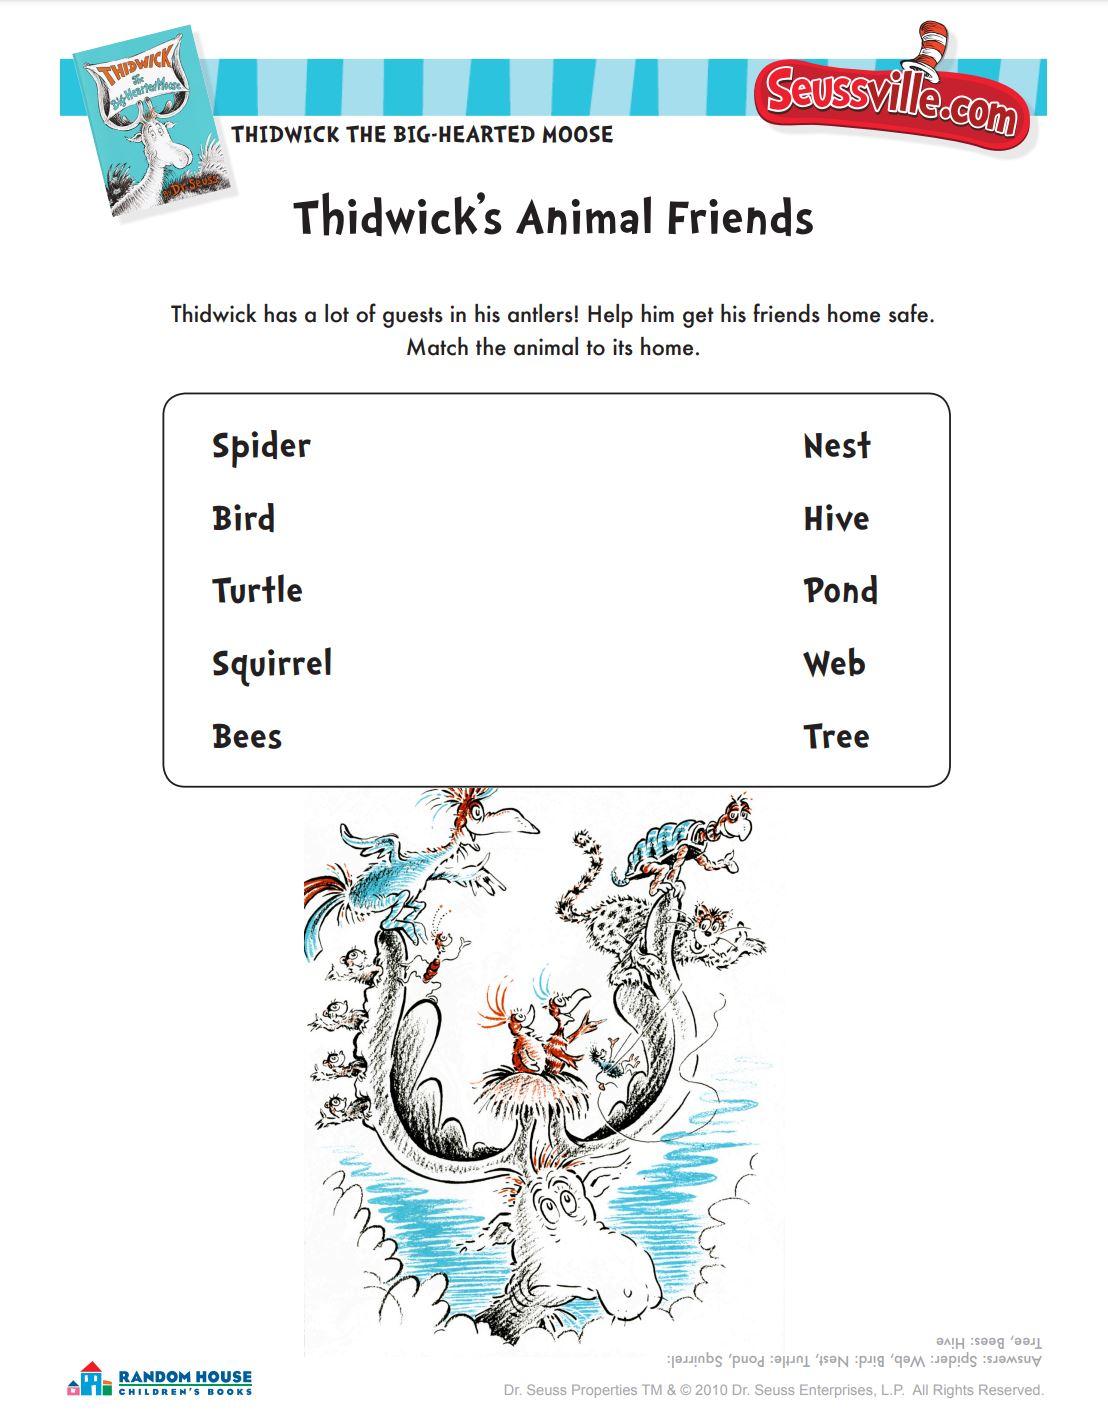 Thidwick's Animal Friends